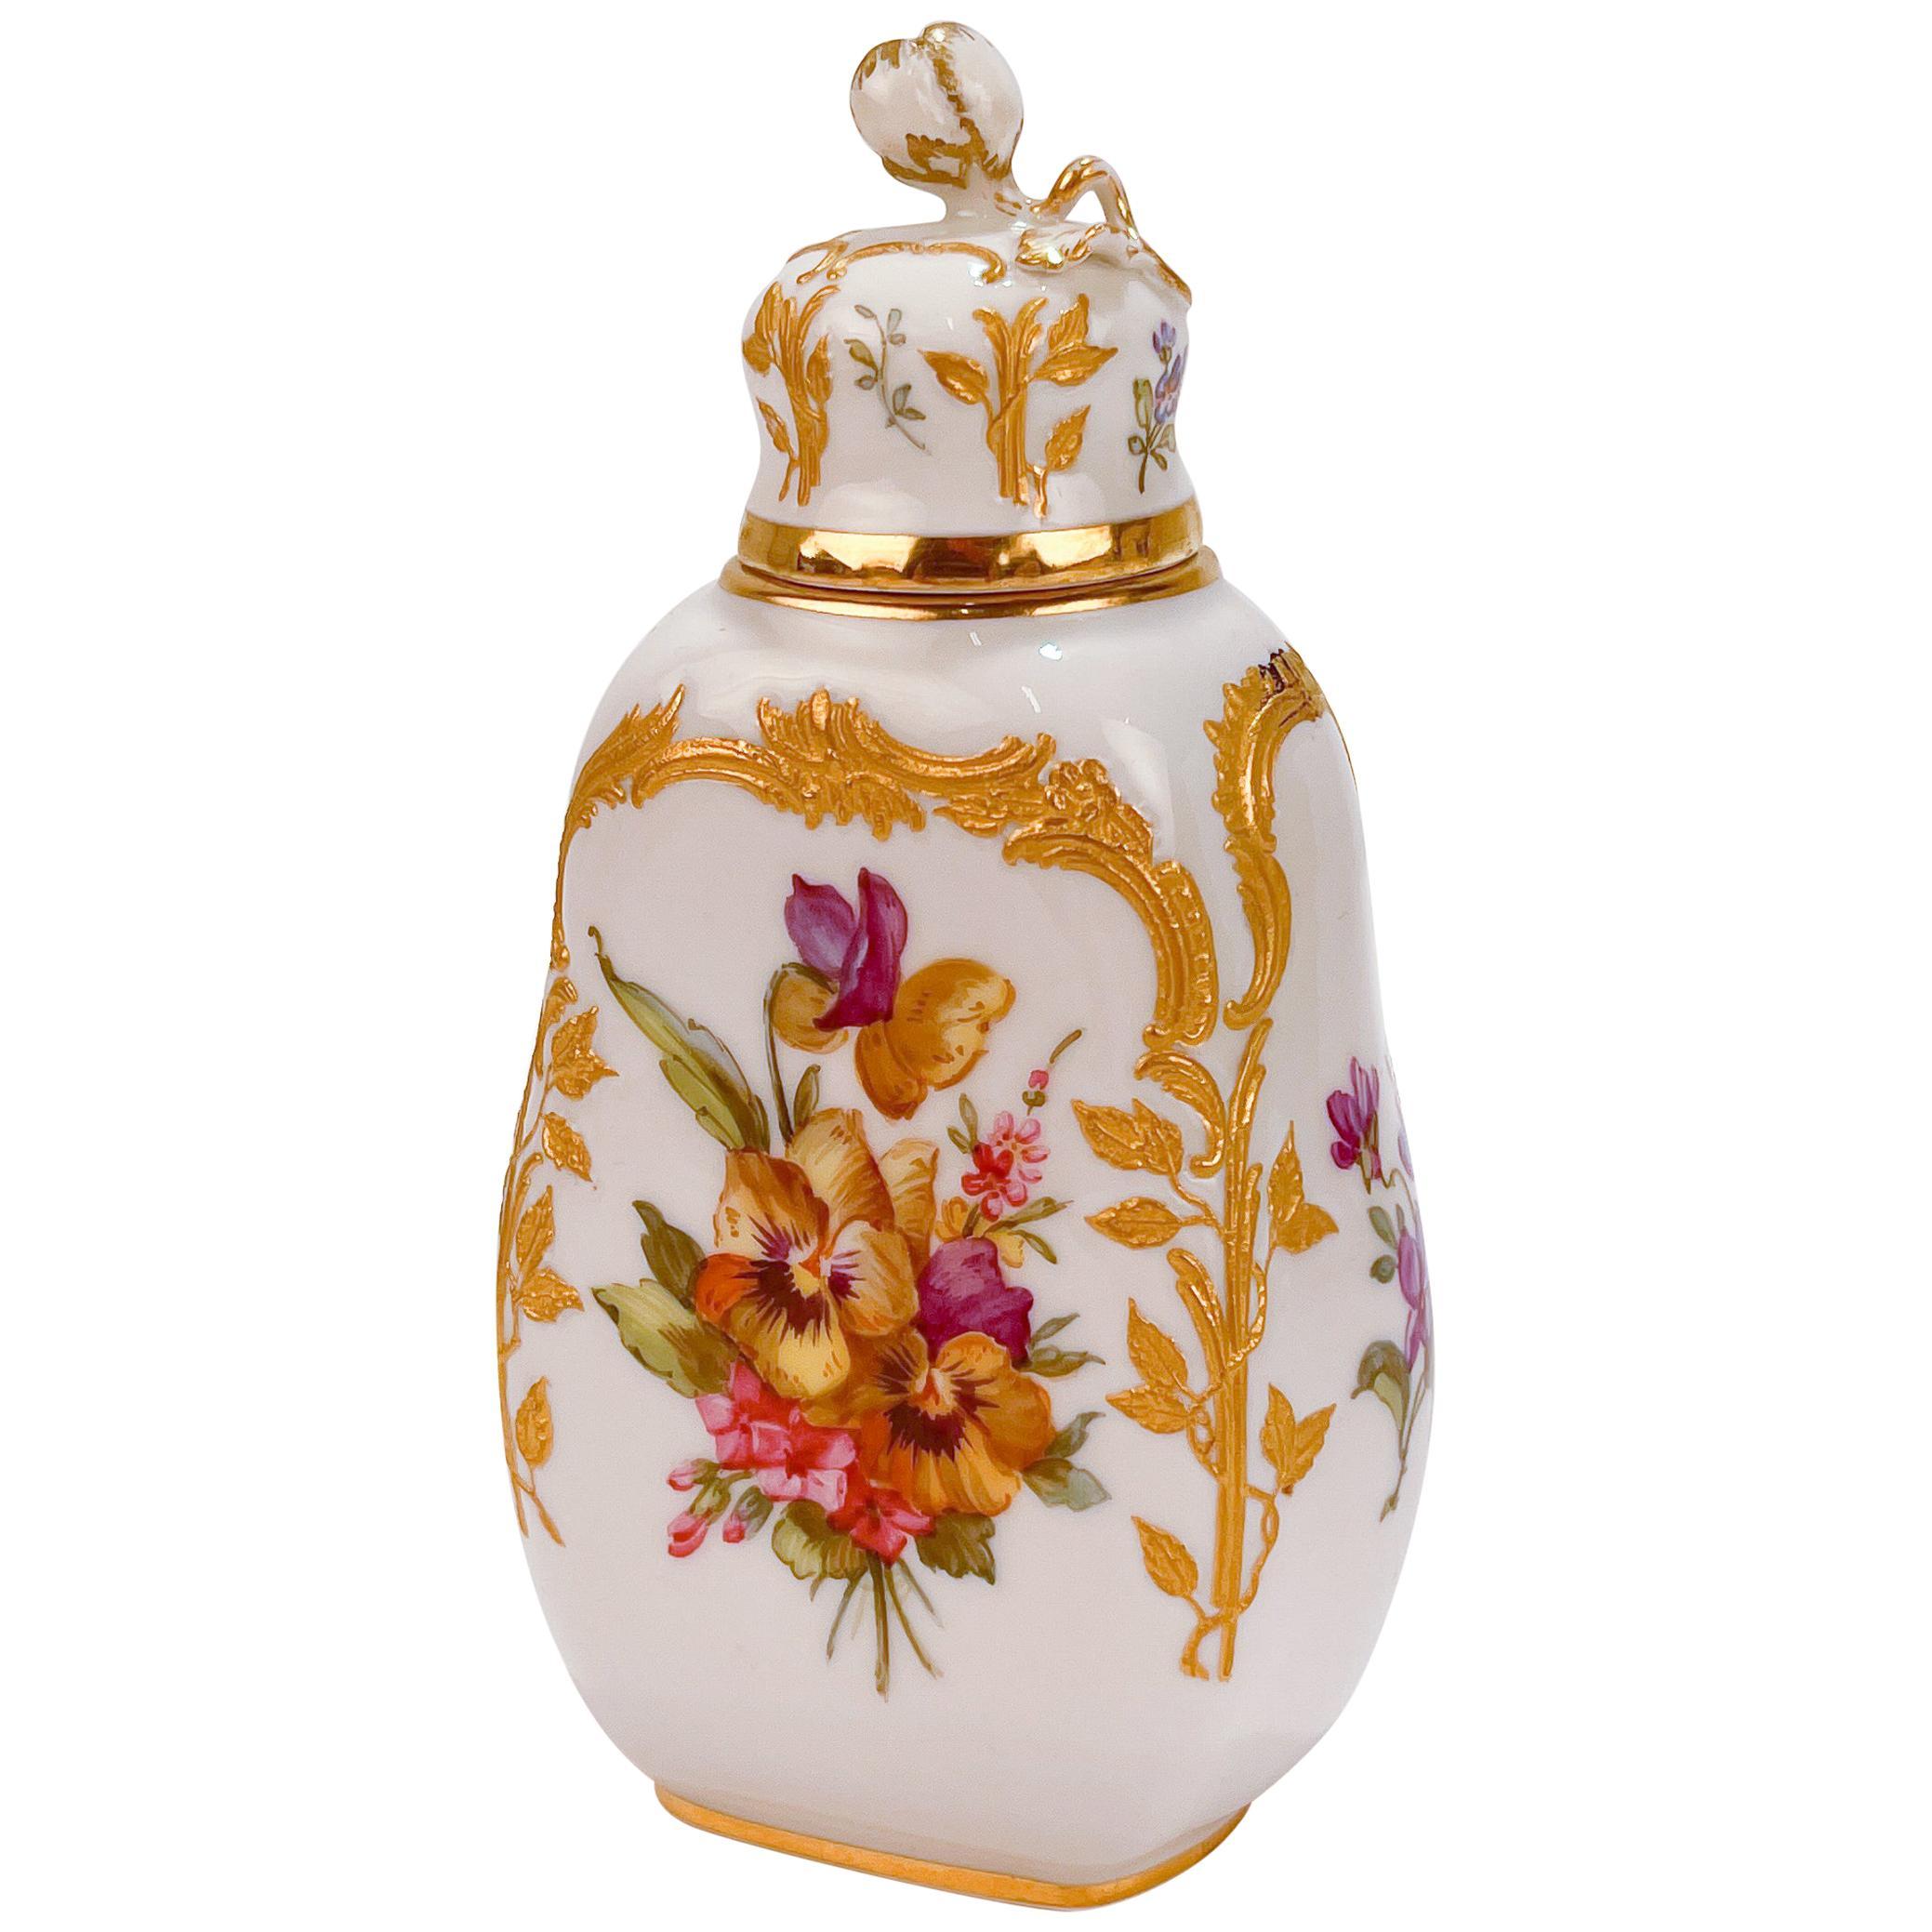 Antique KPM Royal Berlin Neuzierat Porcelain Tea Caddy or Dresser Bottle